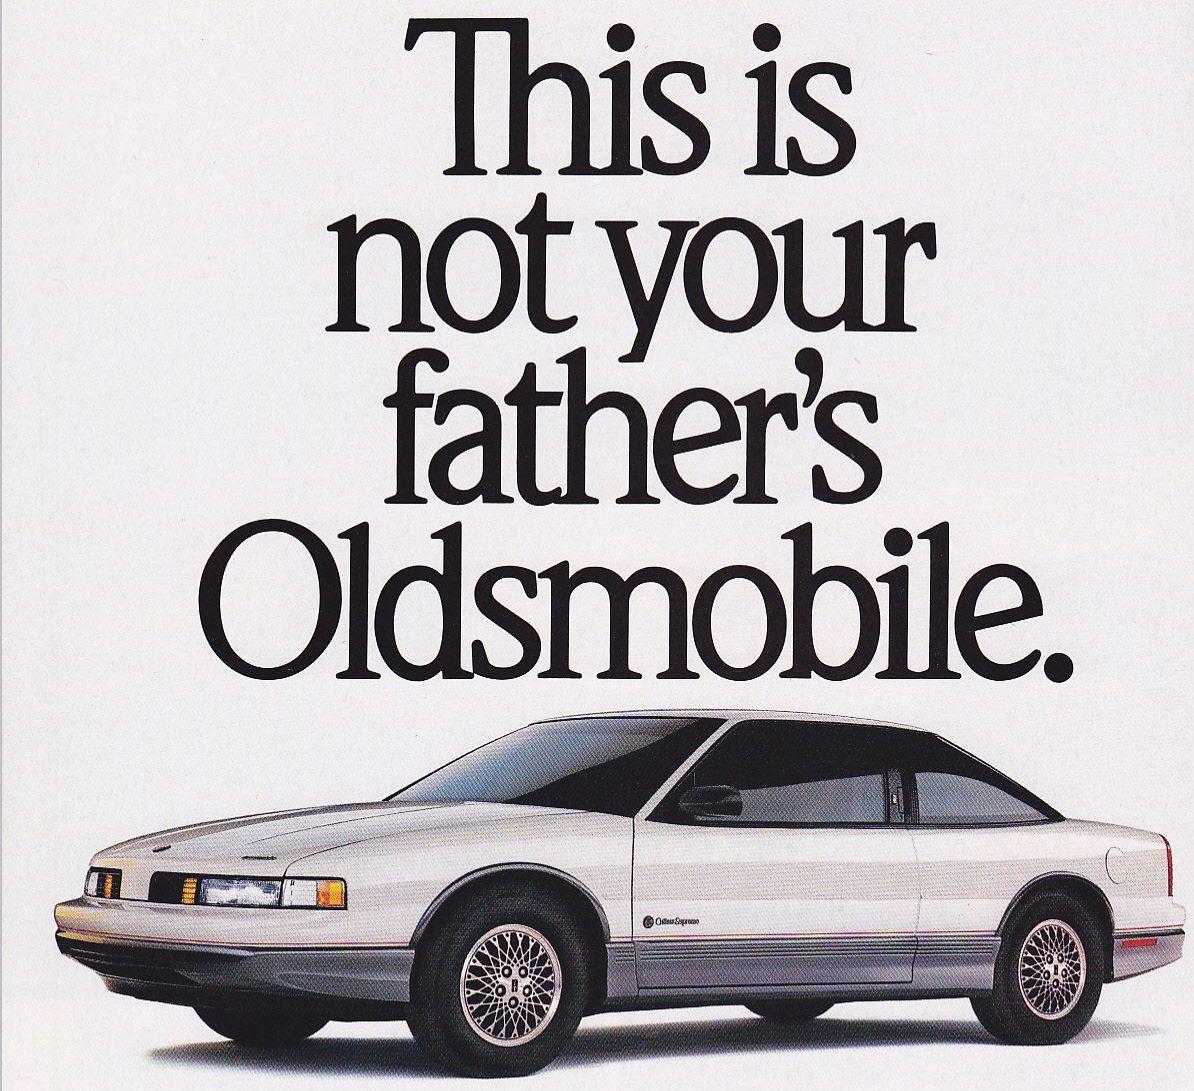 1989 Oldsmobile Cutlass Supreme advert